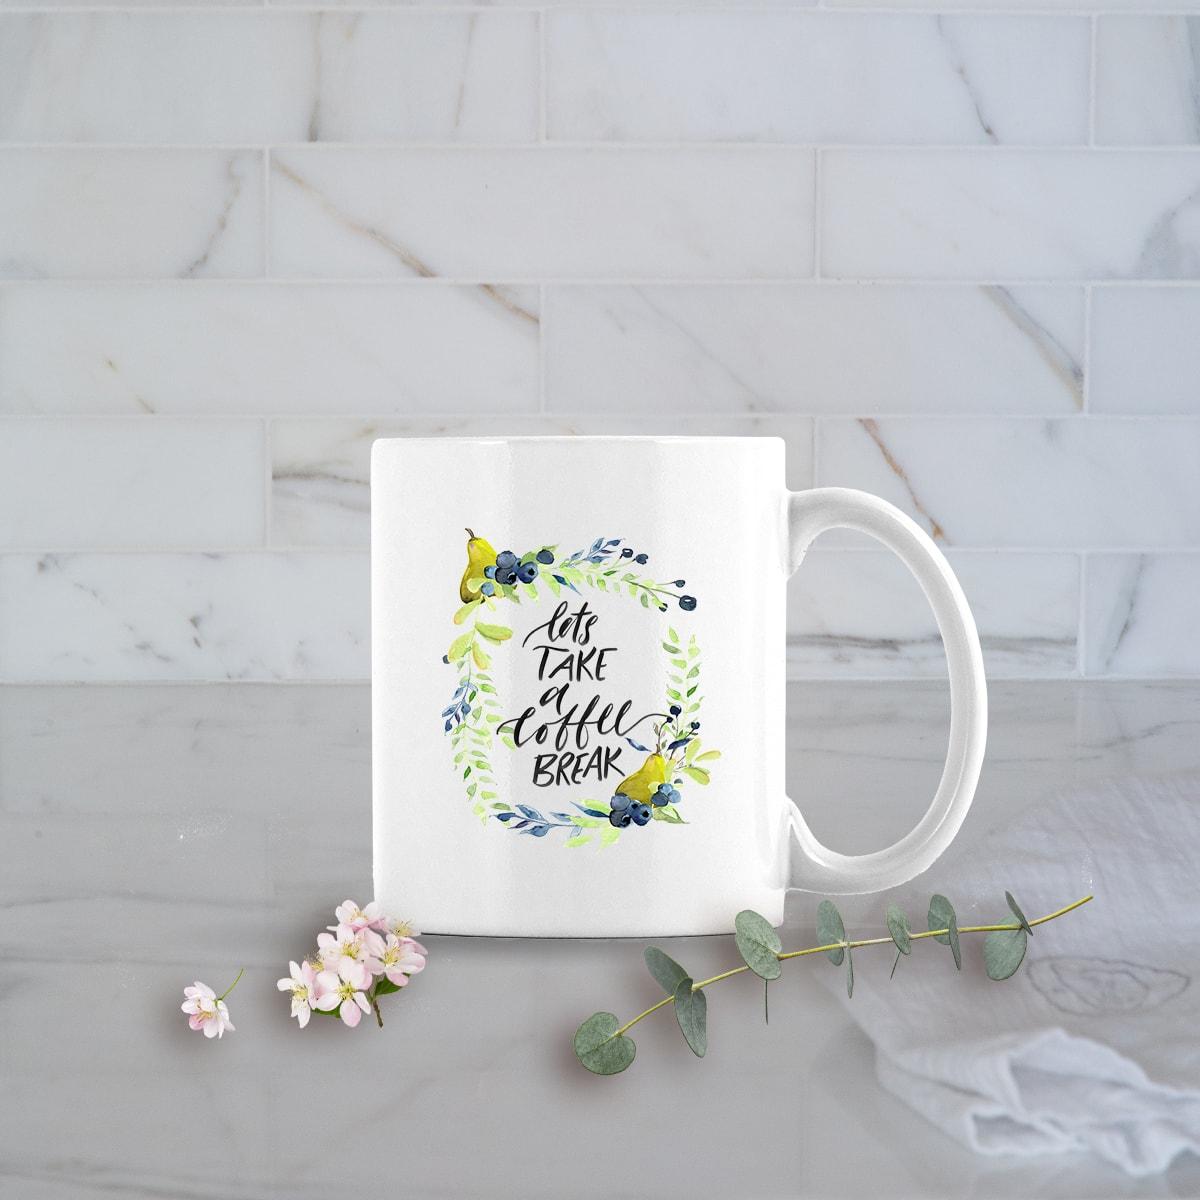 Posh Cottage Shop Winter 19 Coffee Break white 11oz mug